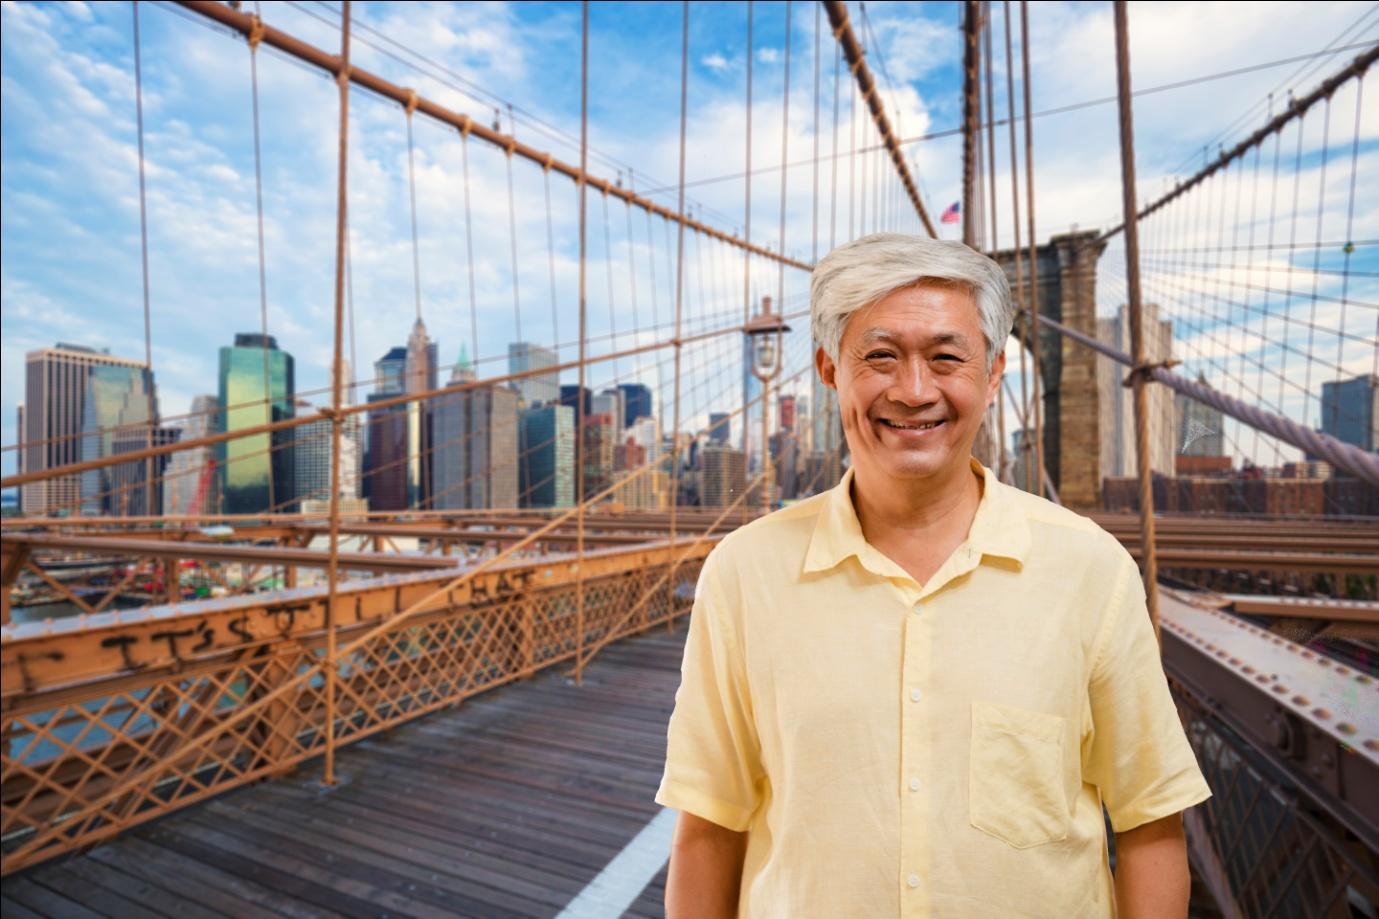 new-york-city-brooklyn-bridge-manhattan_with yellow shirt uncle_usve.jpg